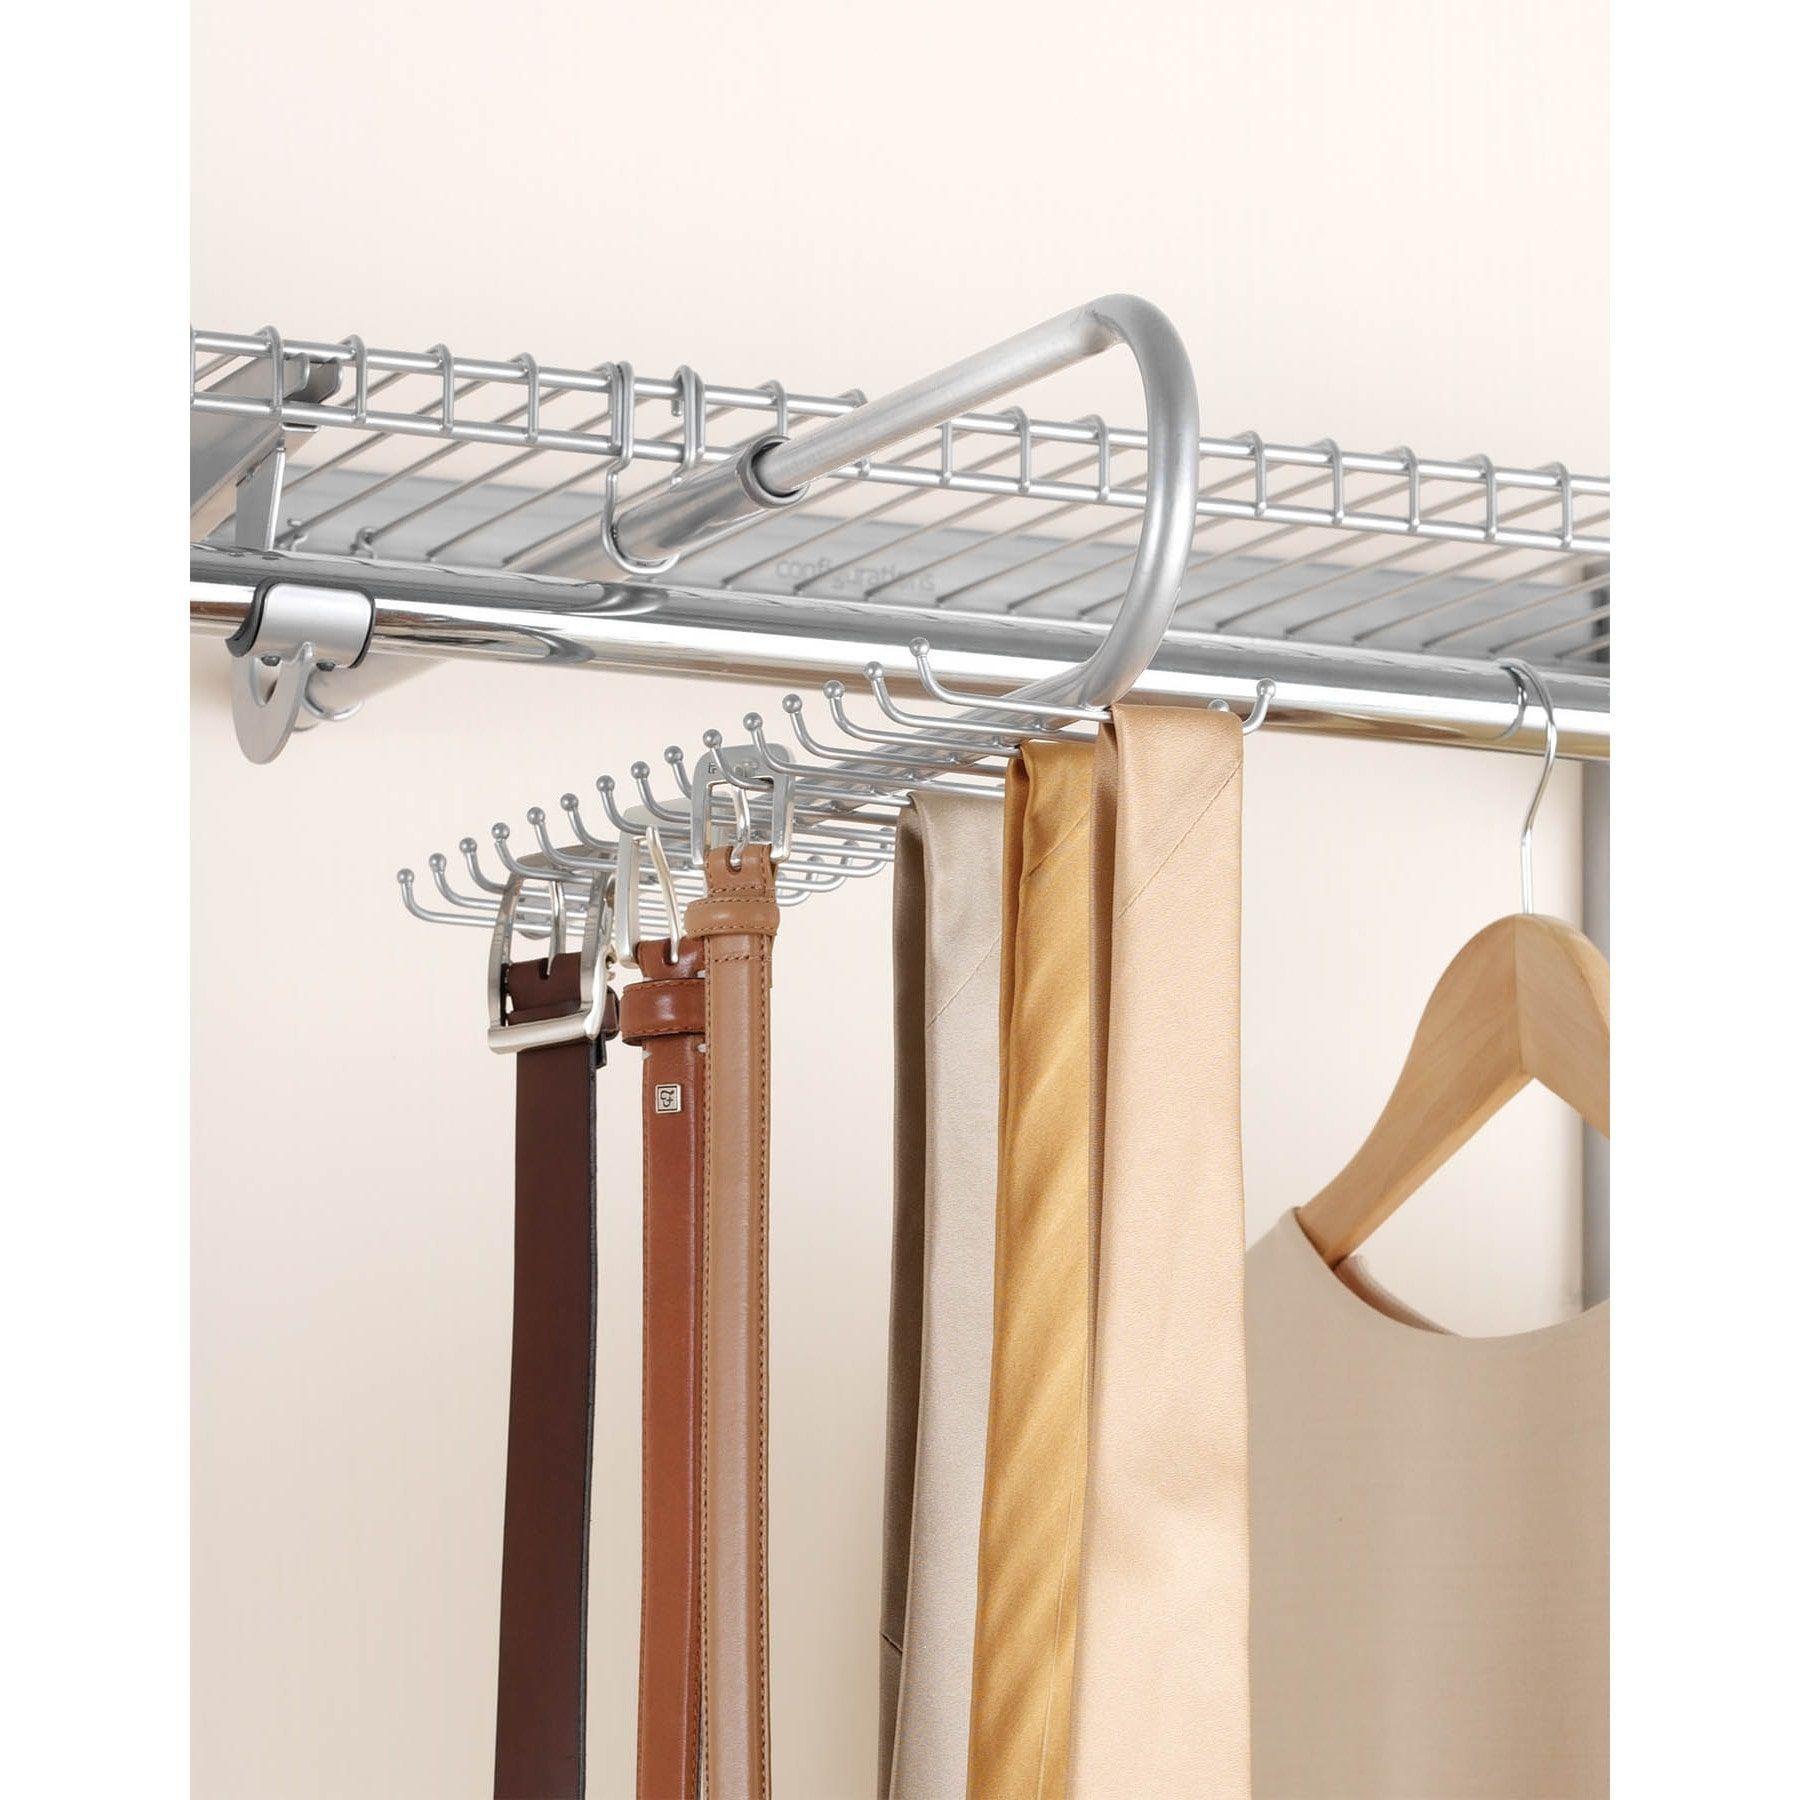 rubbermaid outdoor large shelves deck vertical plastic tool takealongs storage buildings chest shed closet patio